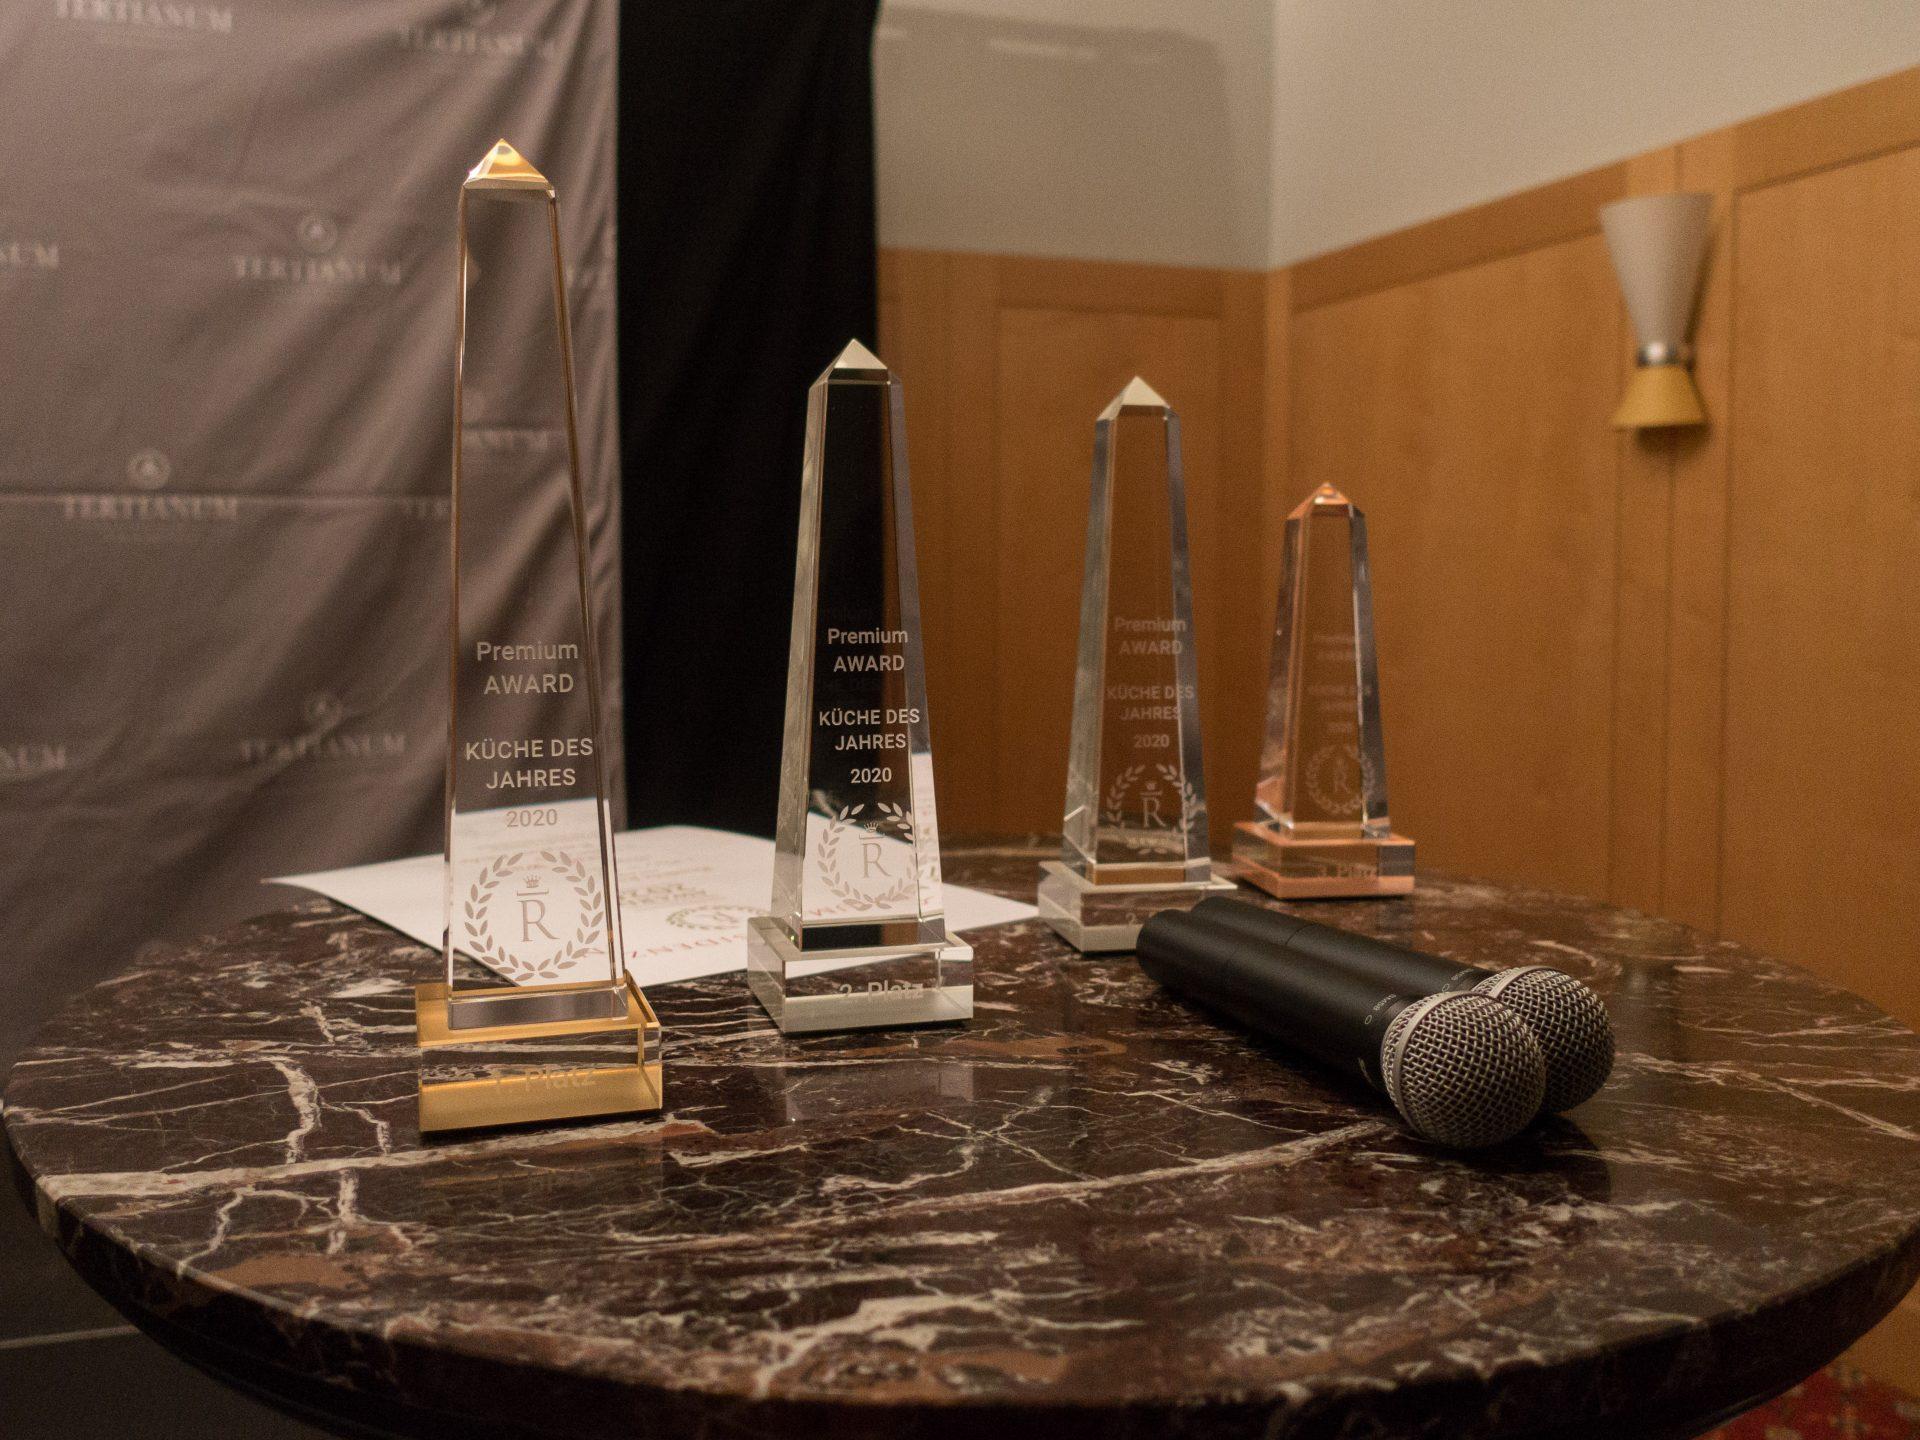 Der Tertianum Residenzen Award